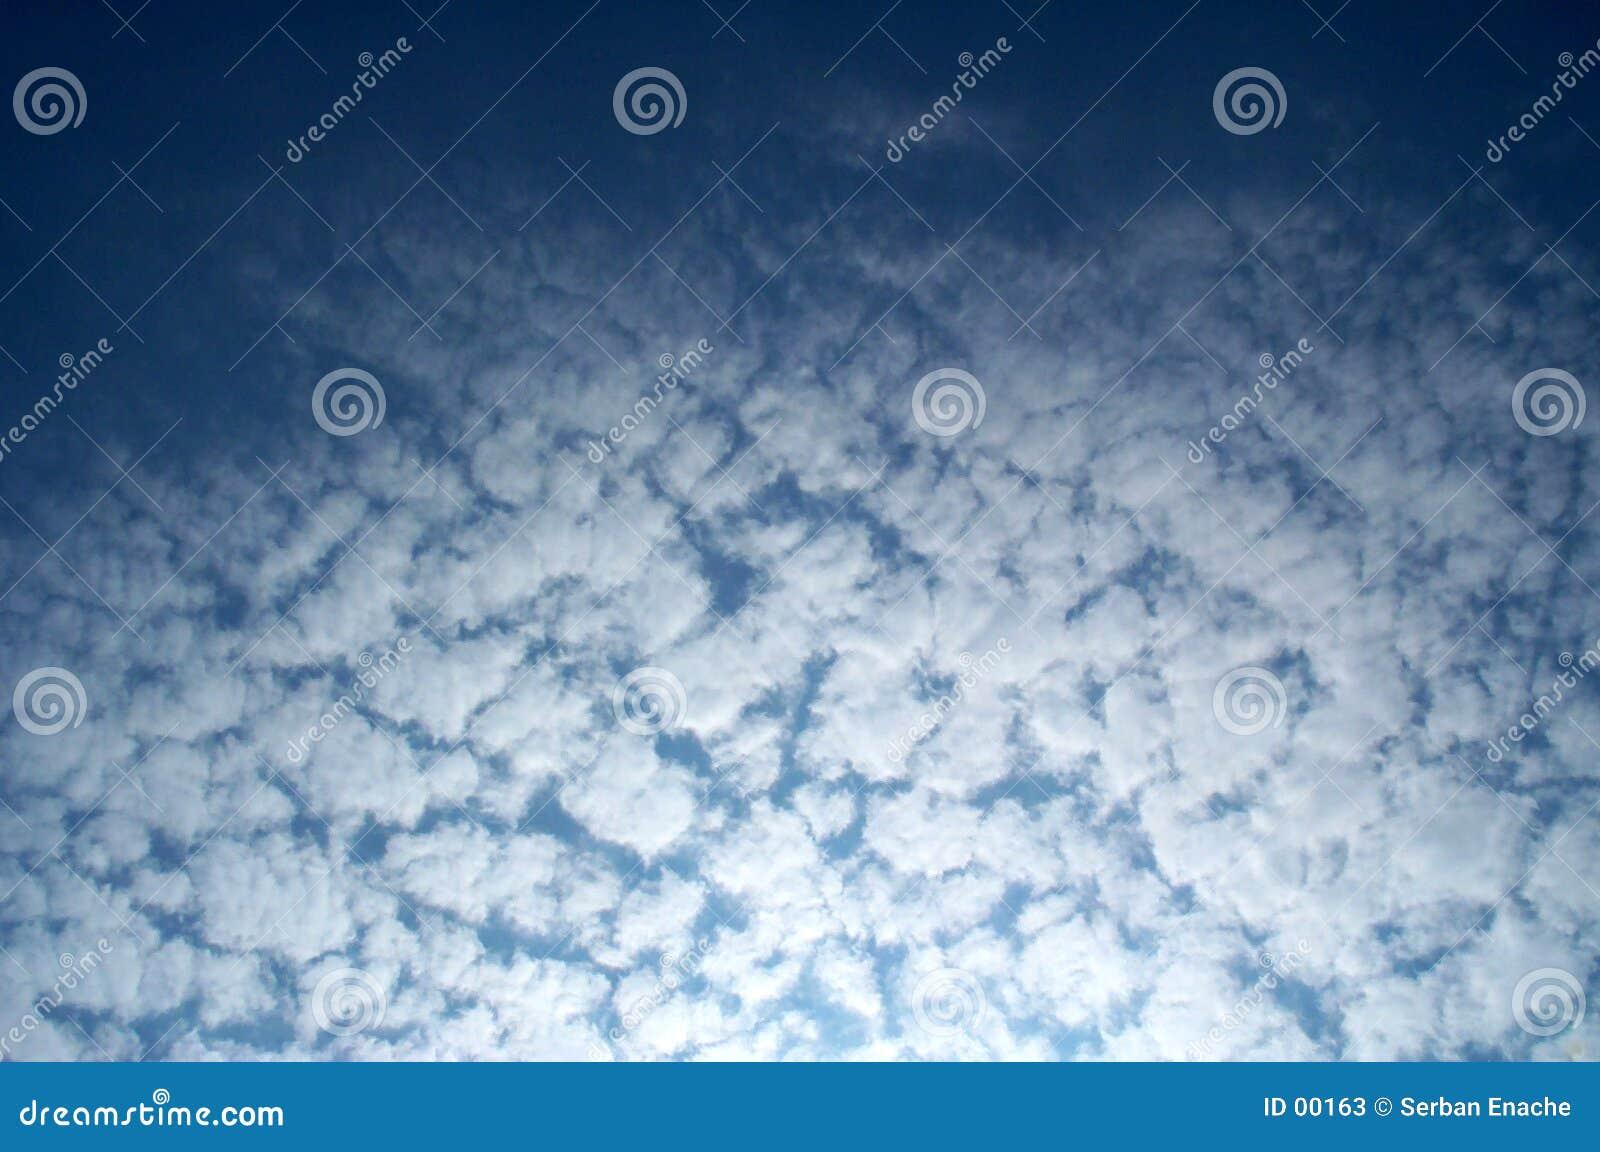 Clouds fractal